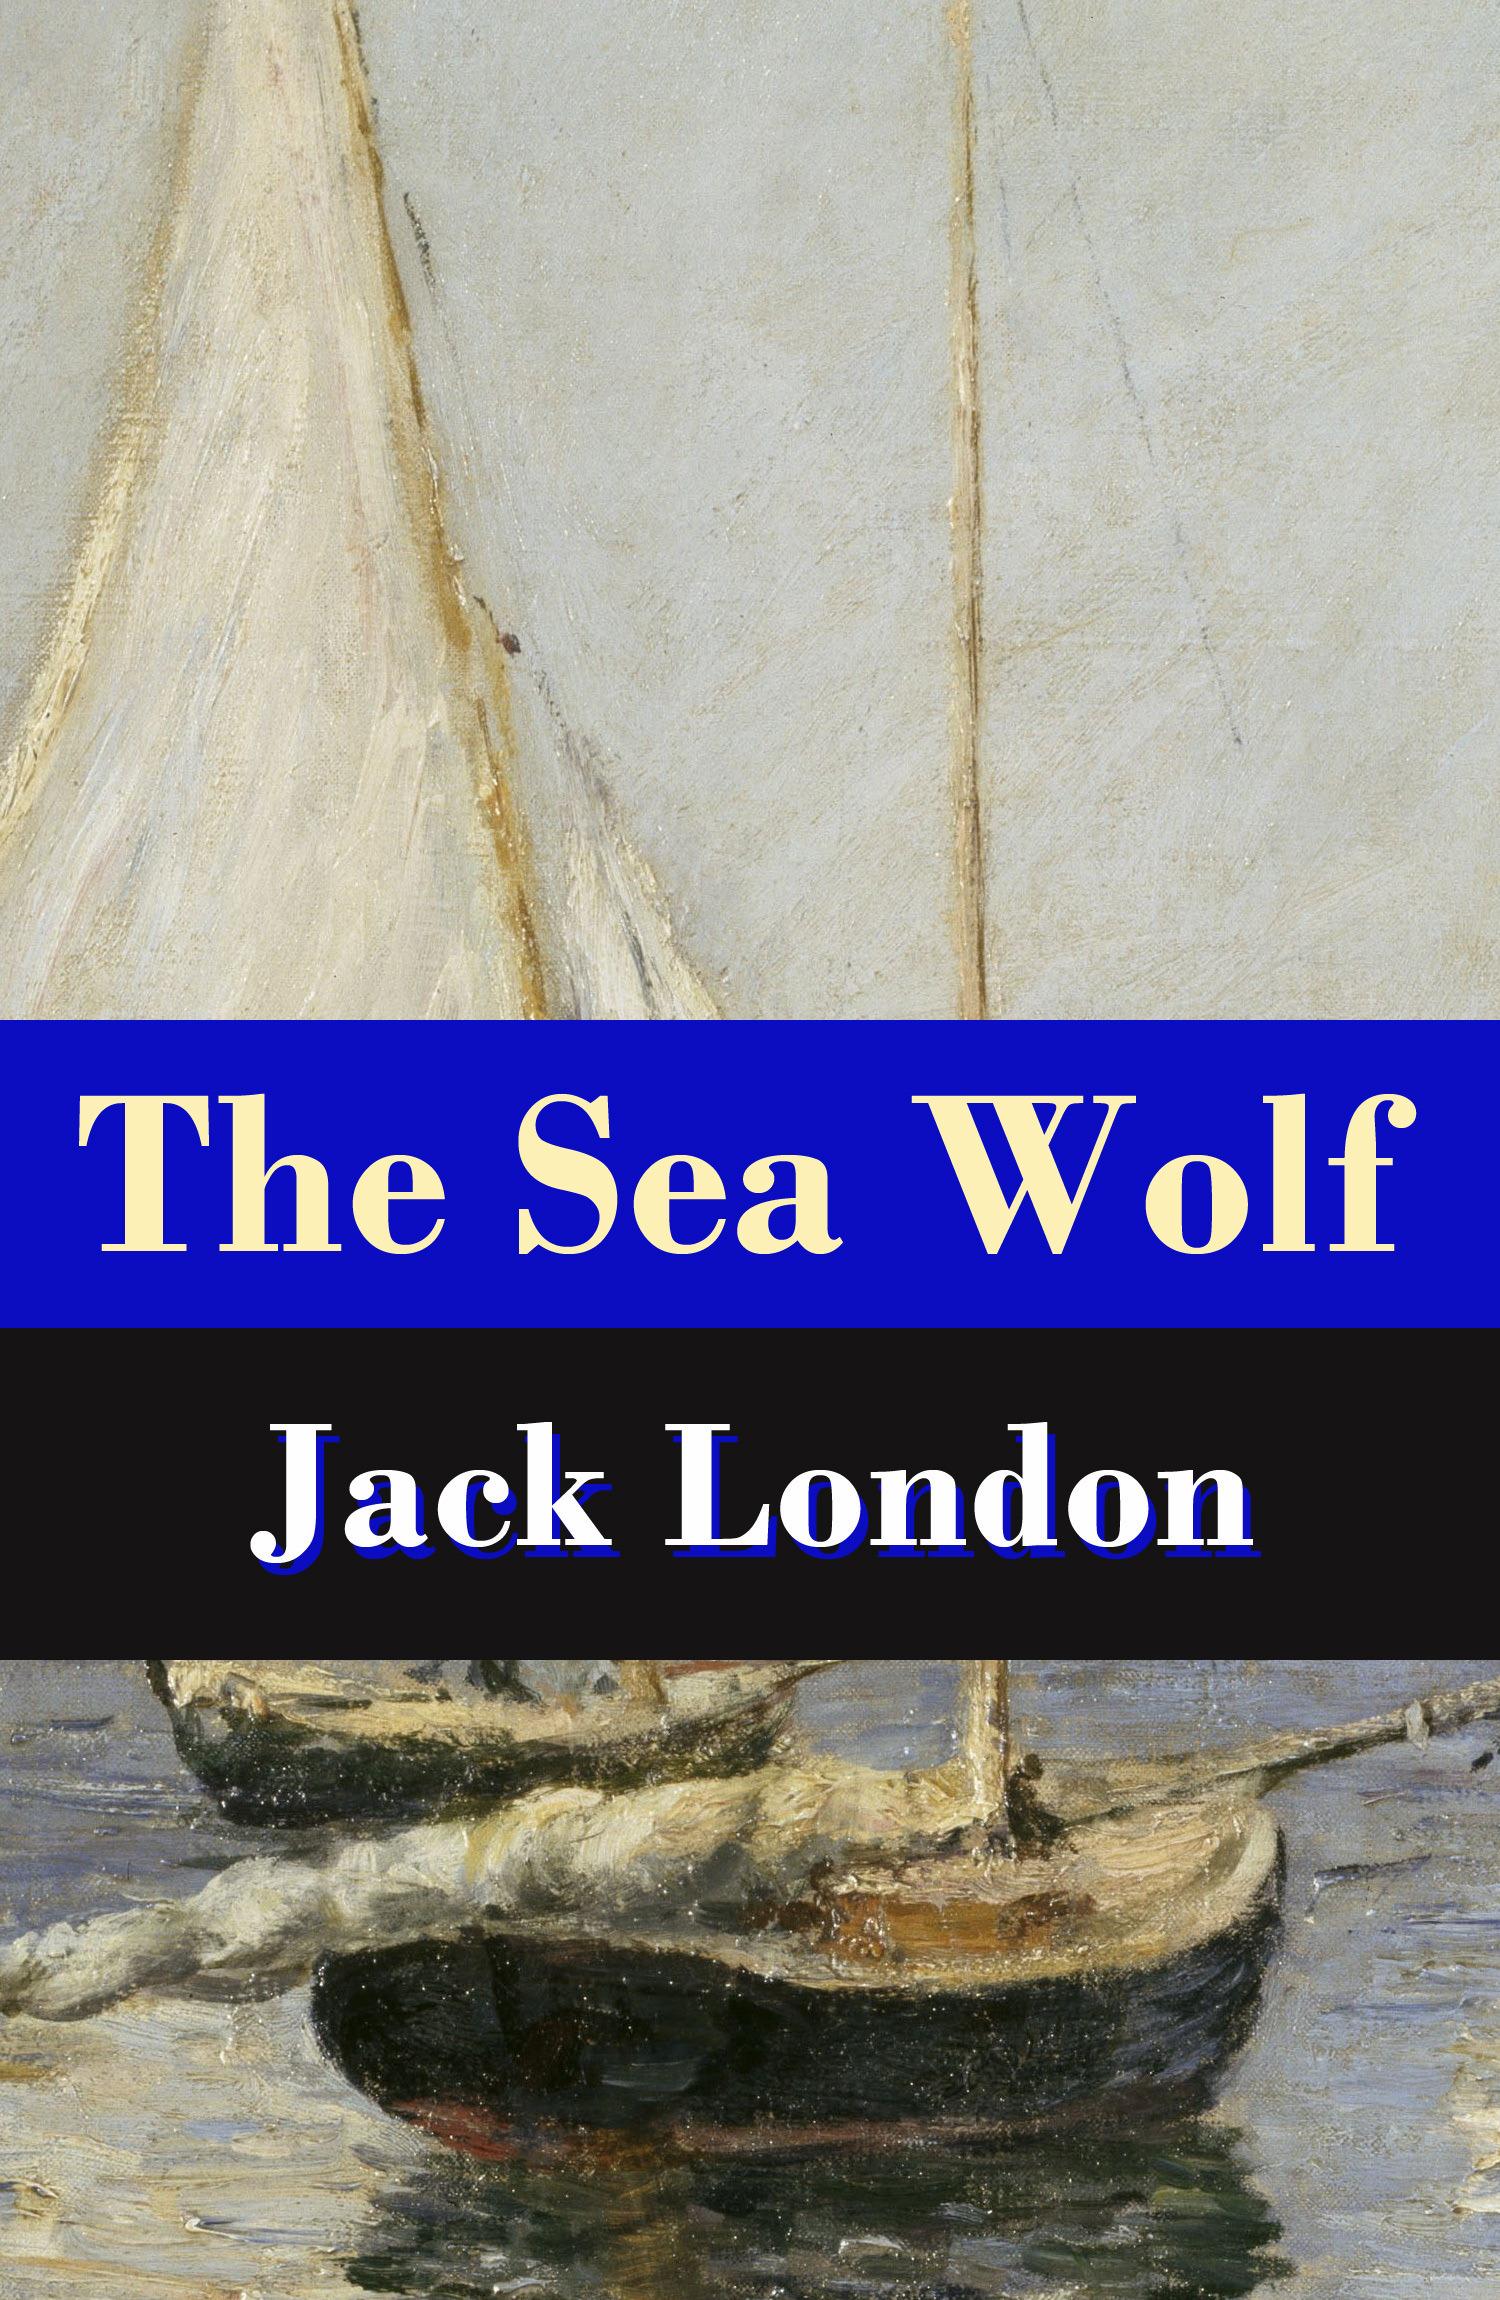 The Sea Wolf (Unabridged)